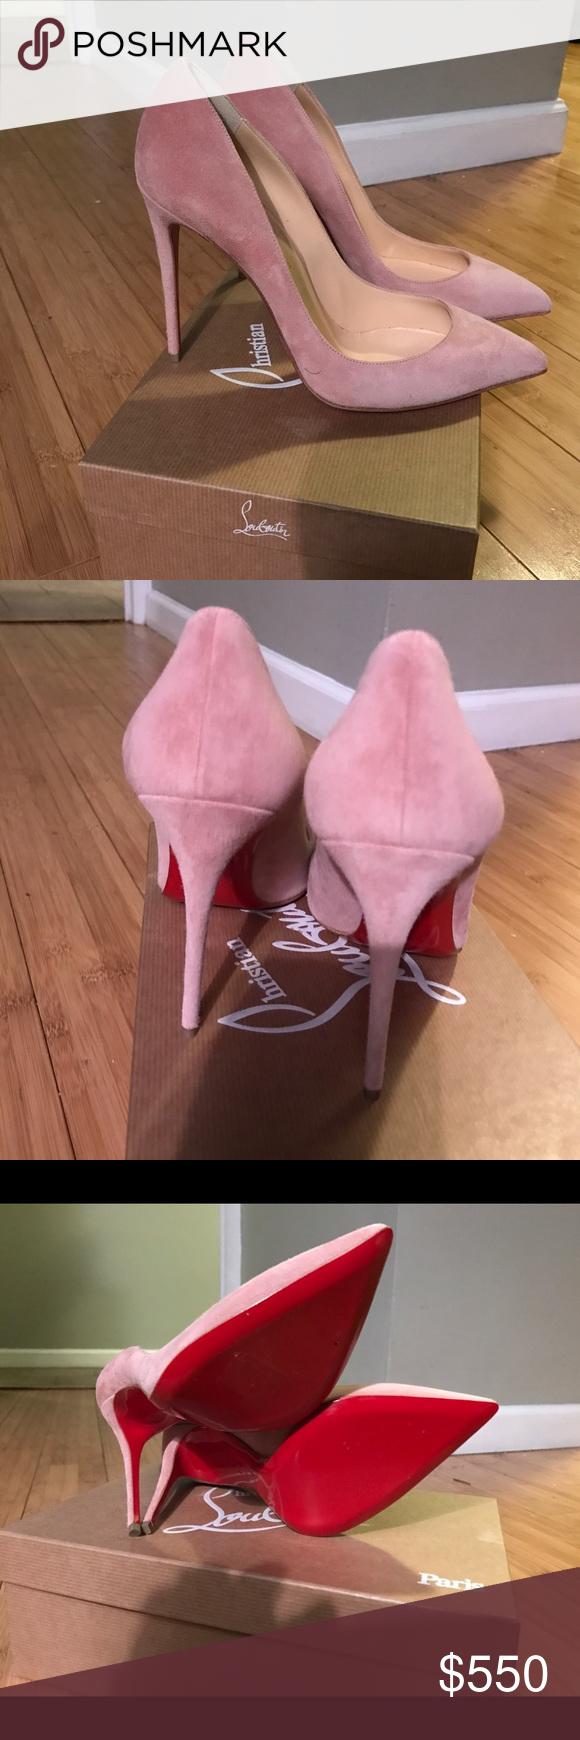 christian louboutin white pigalle louboutin heels 39